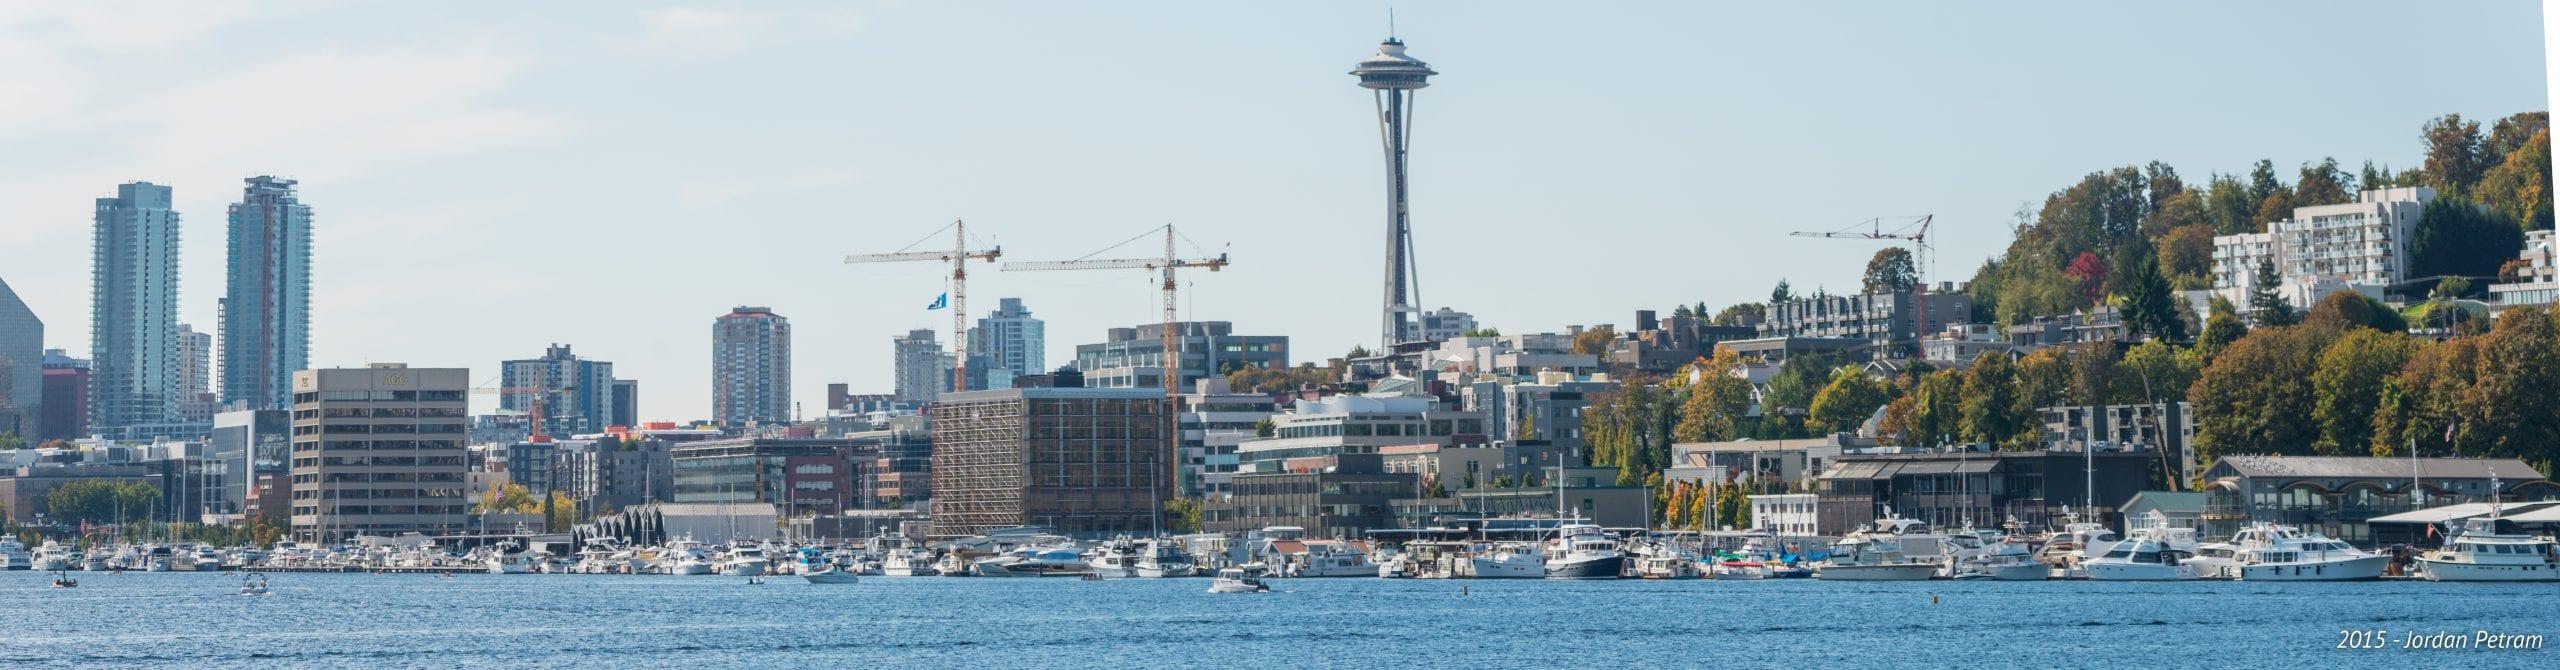 The Seattle skyline. Photo by Jordan Petram, via Flickr creative commons.